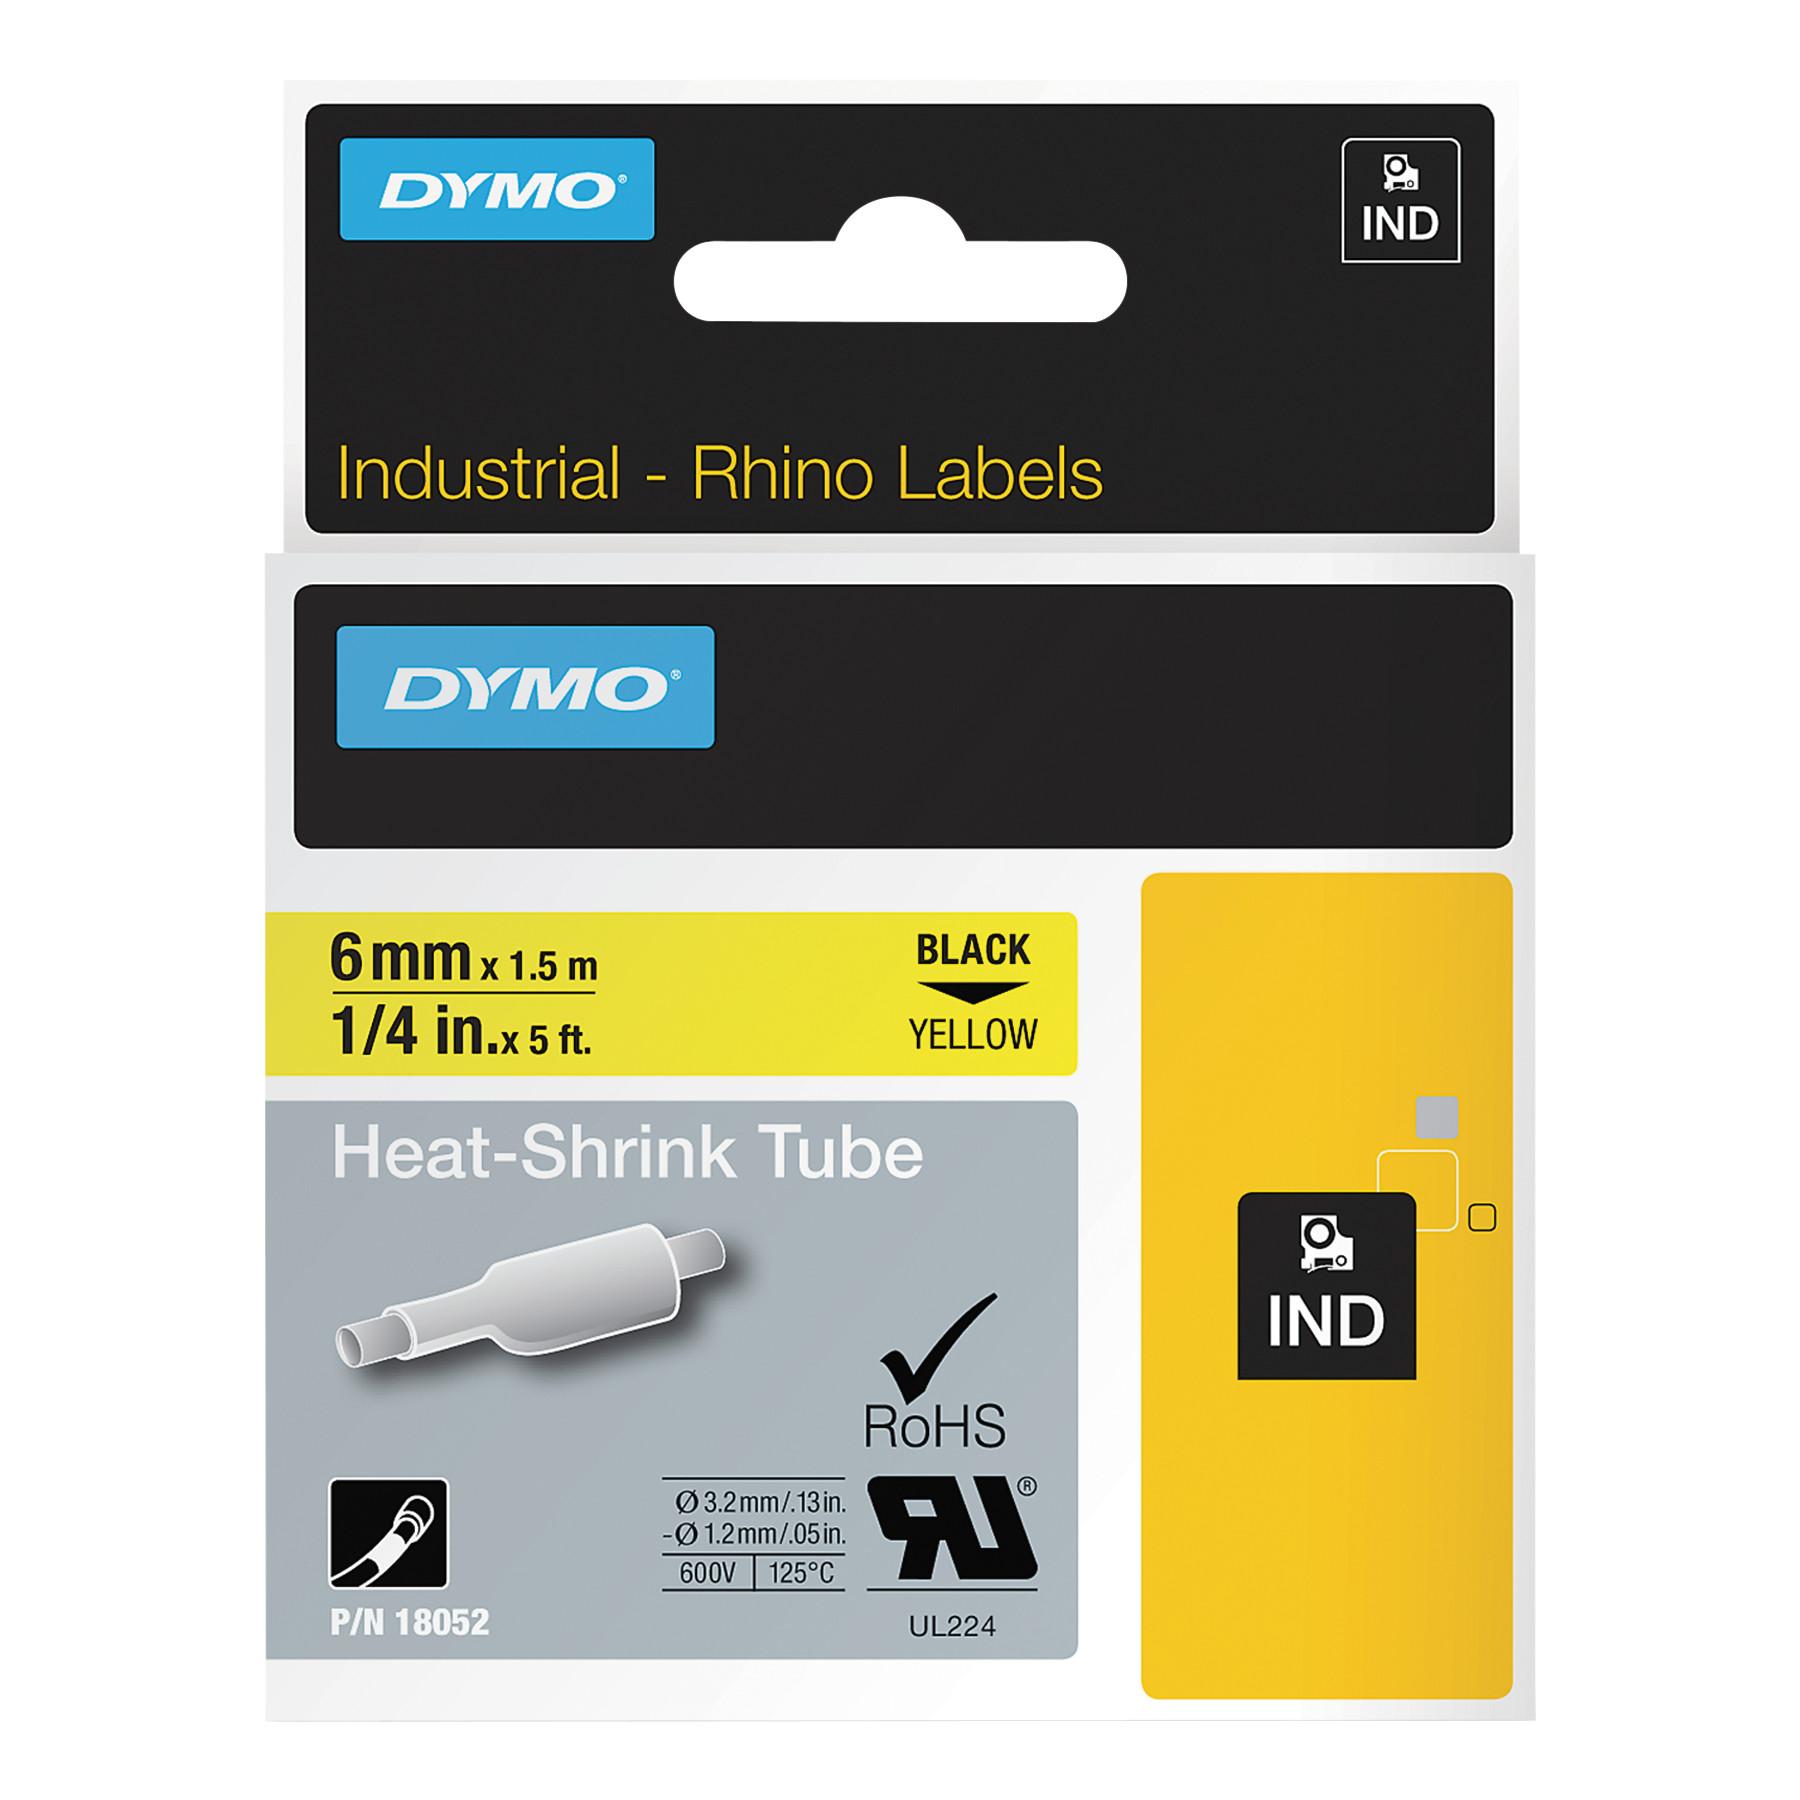 "DYMO Rhino Heat Shrink Tubes Industrial Label Tape, 1 4"" x 5 ft, Yellow Black Print by DYMO"